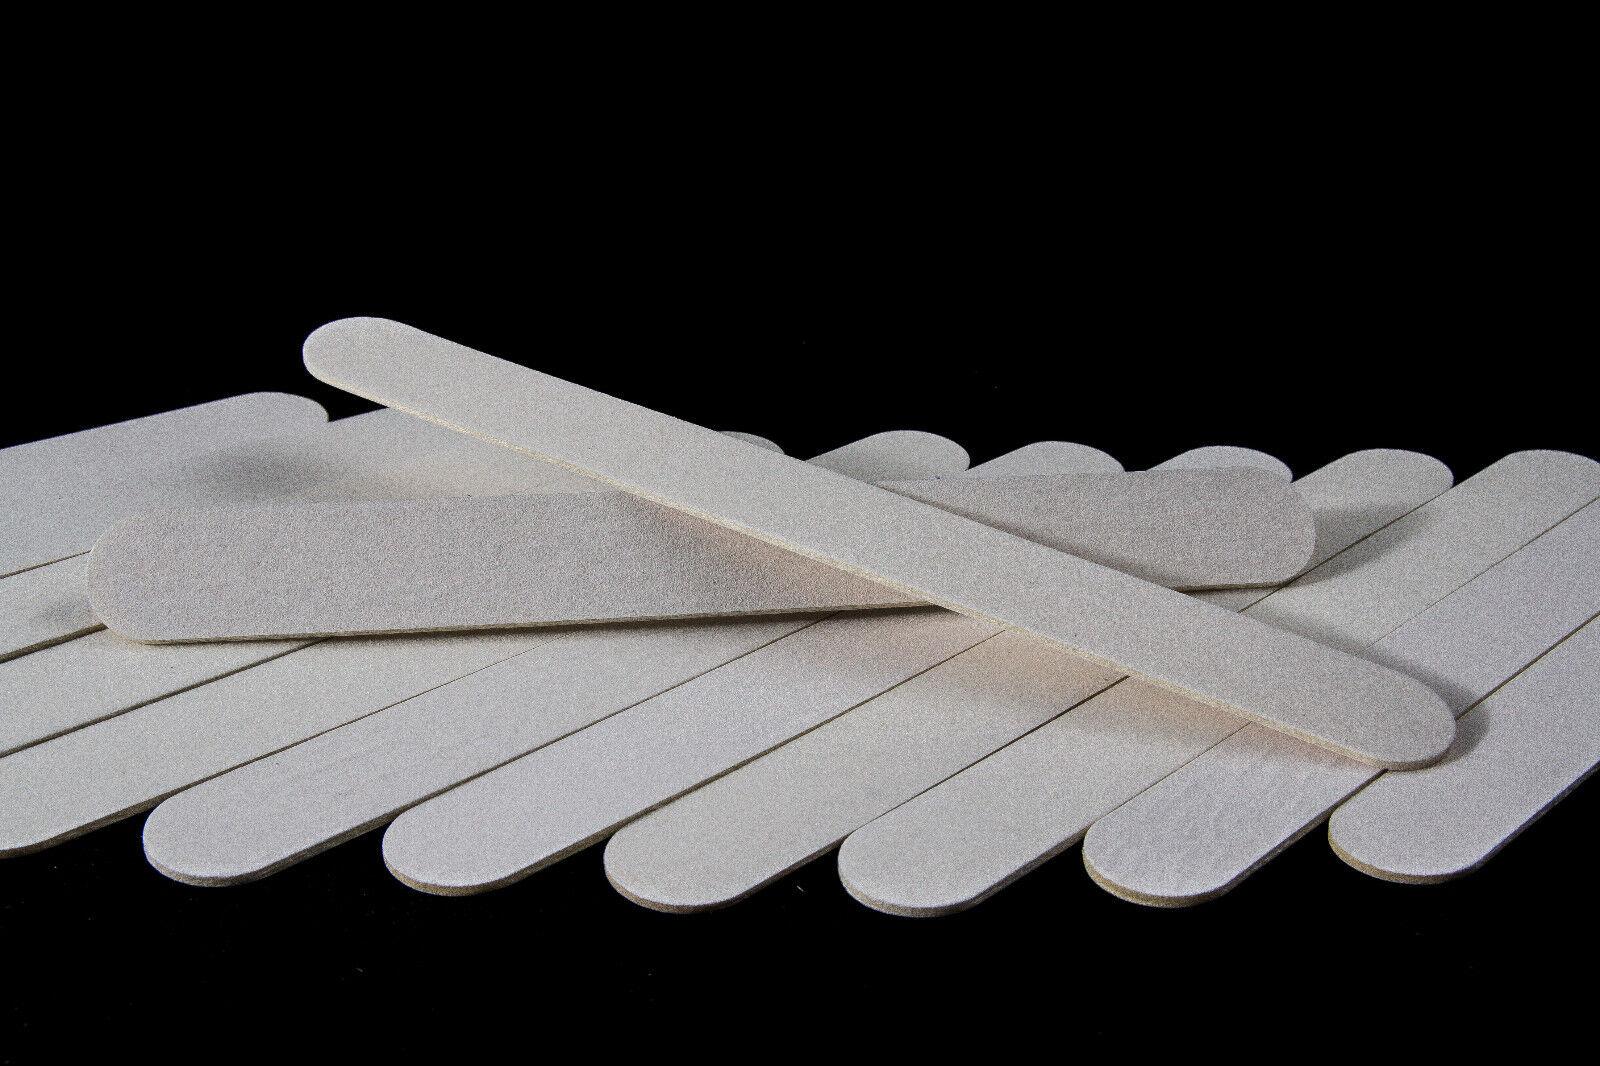 Holzspatel,Holzmundspatel,Wachs Zuckerpaste Spatel,Arzt Tattoo 50-1000 stück